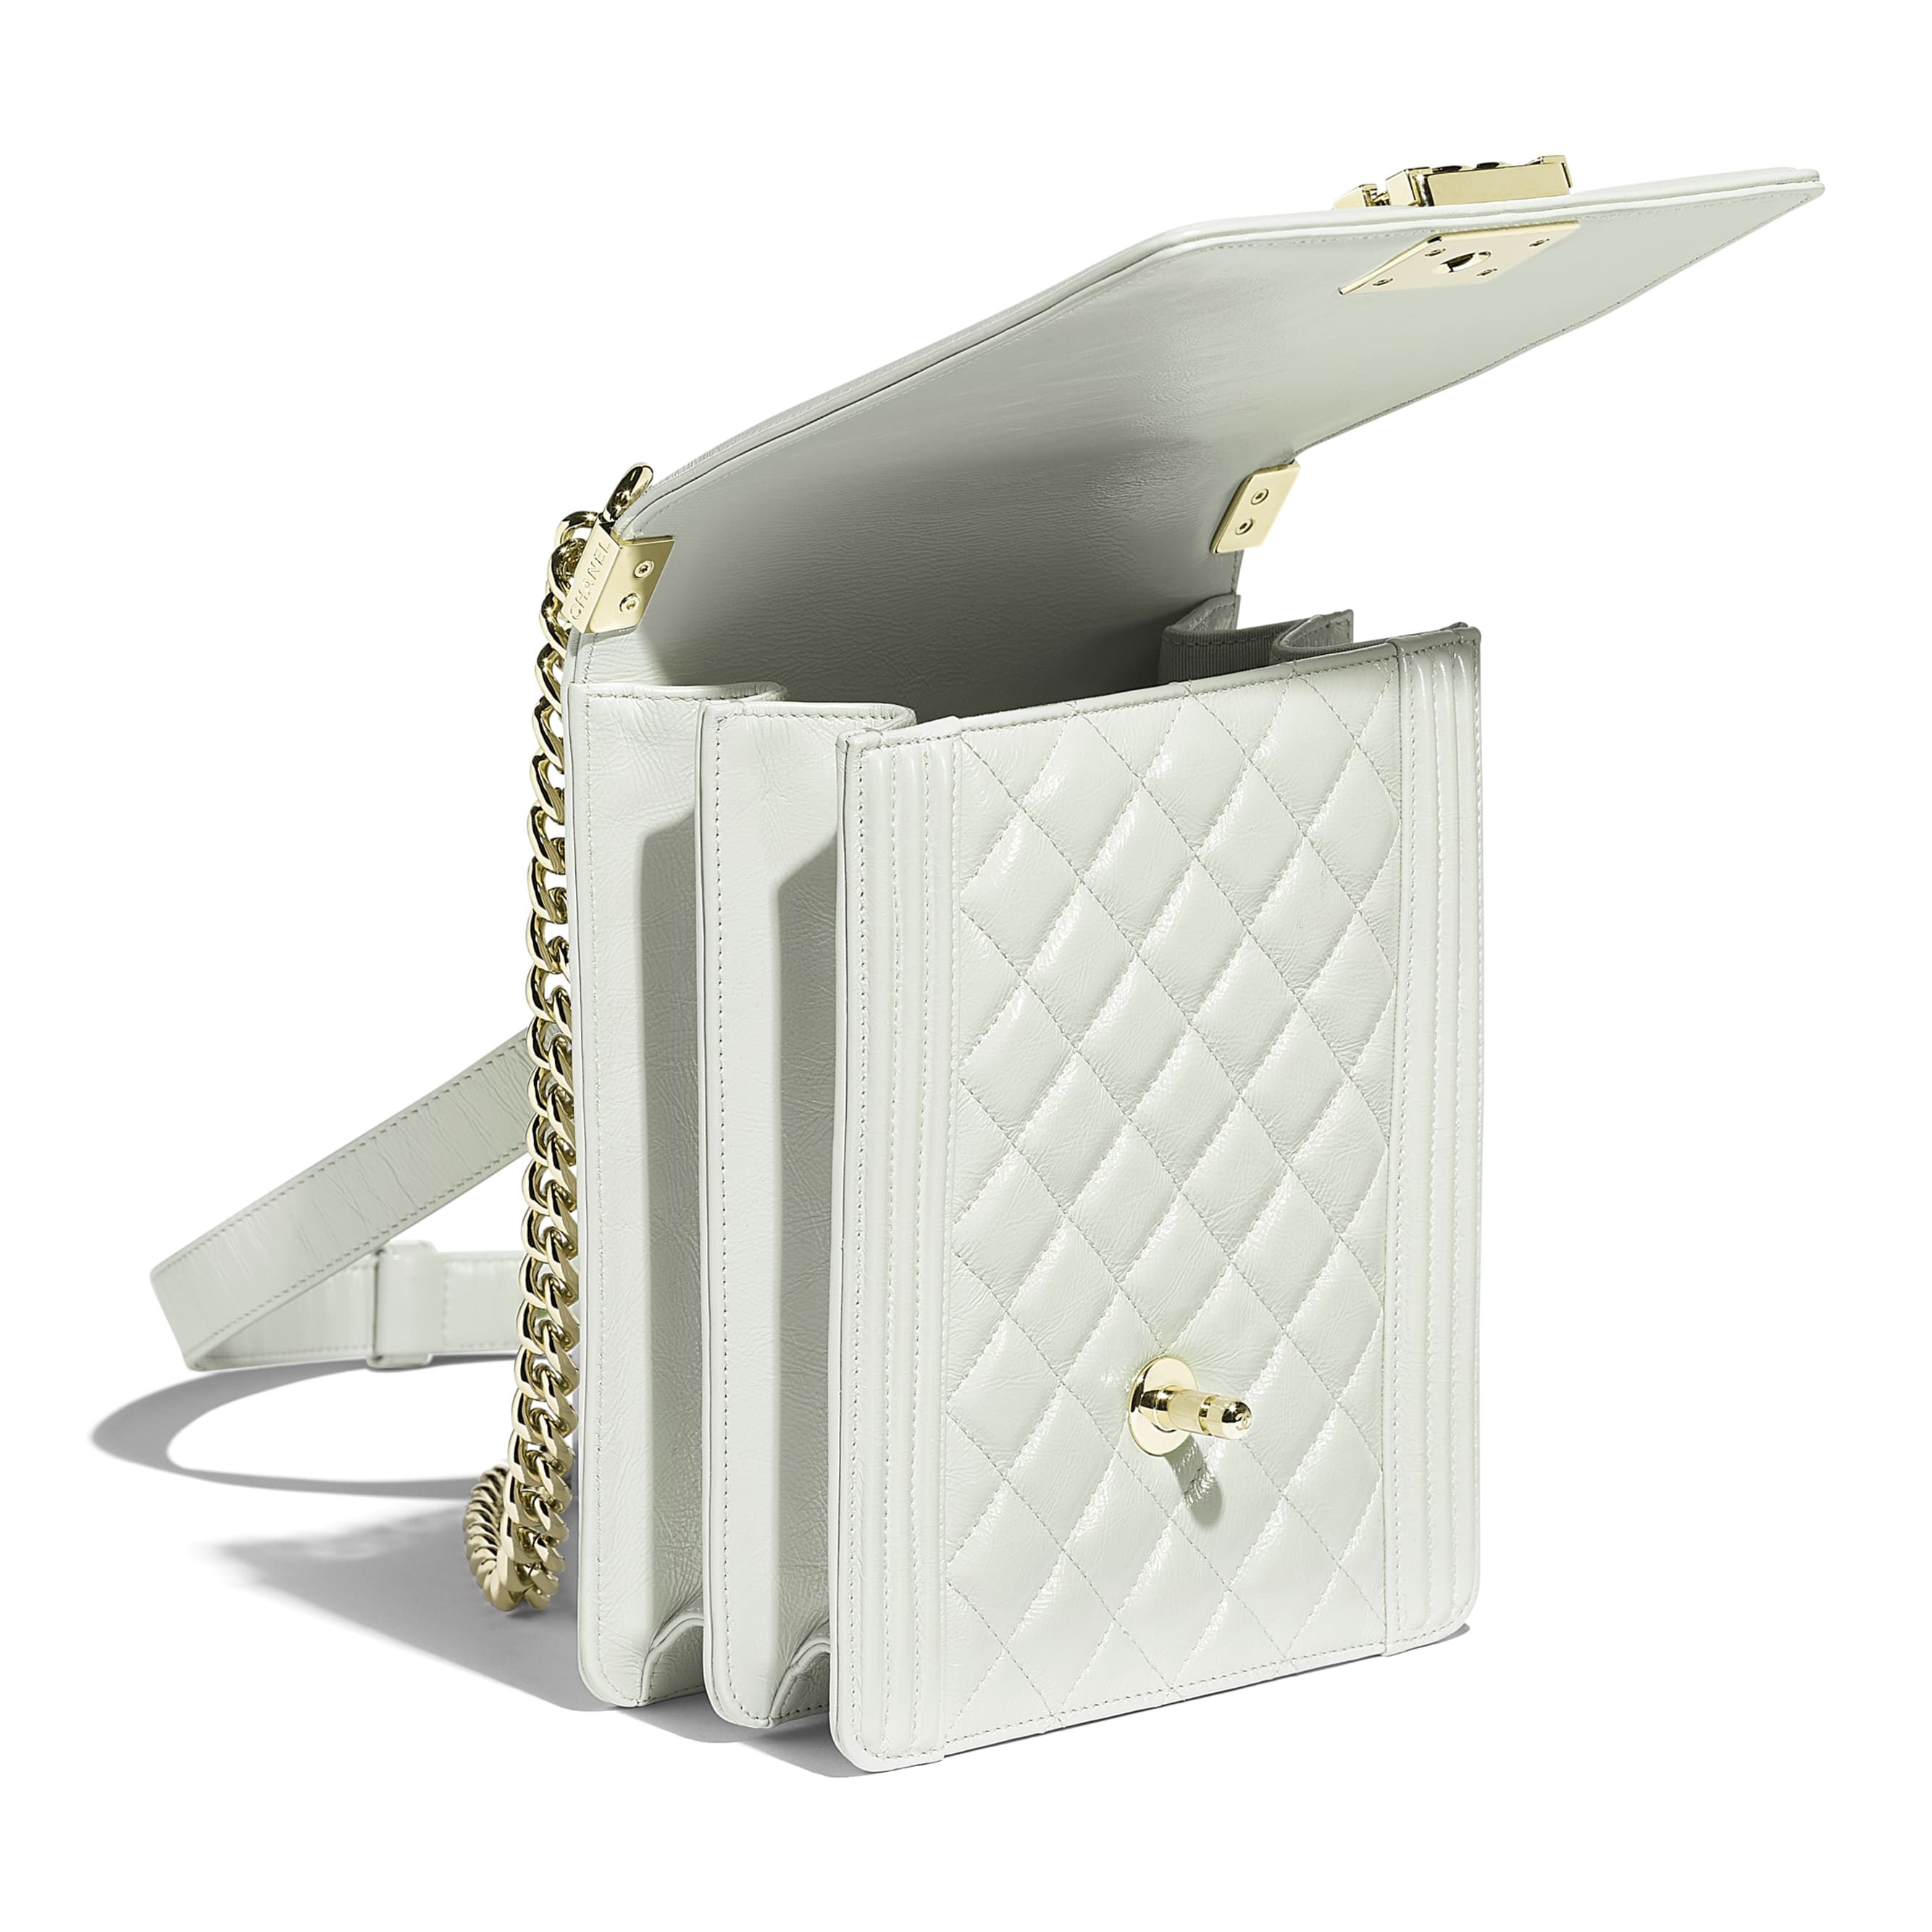 BOY CHANEL Handbag - Light Gray - Iridescent Calfskin & Gold-Tone Metal - Other view - see standard sized version